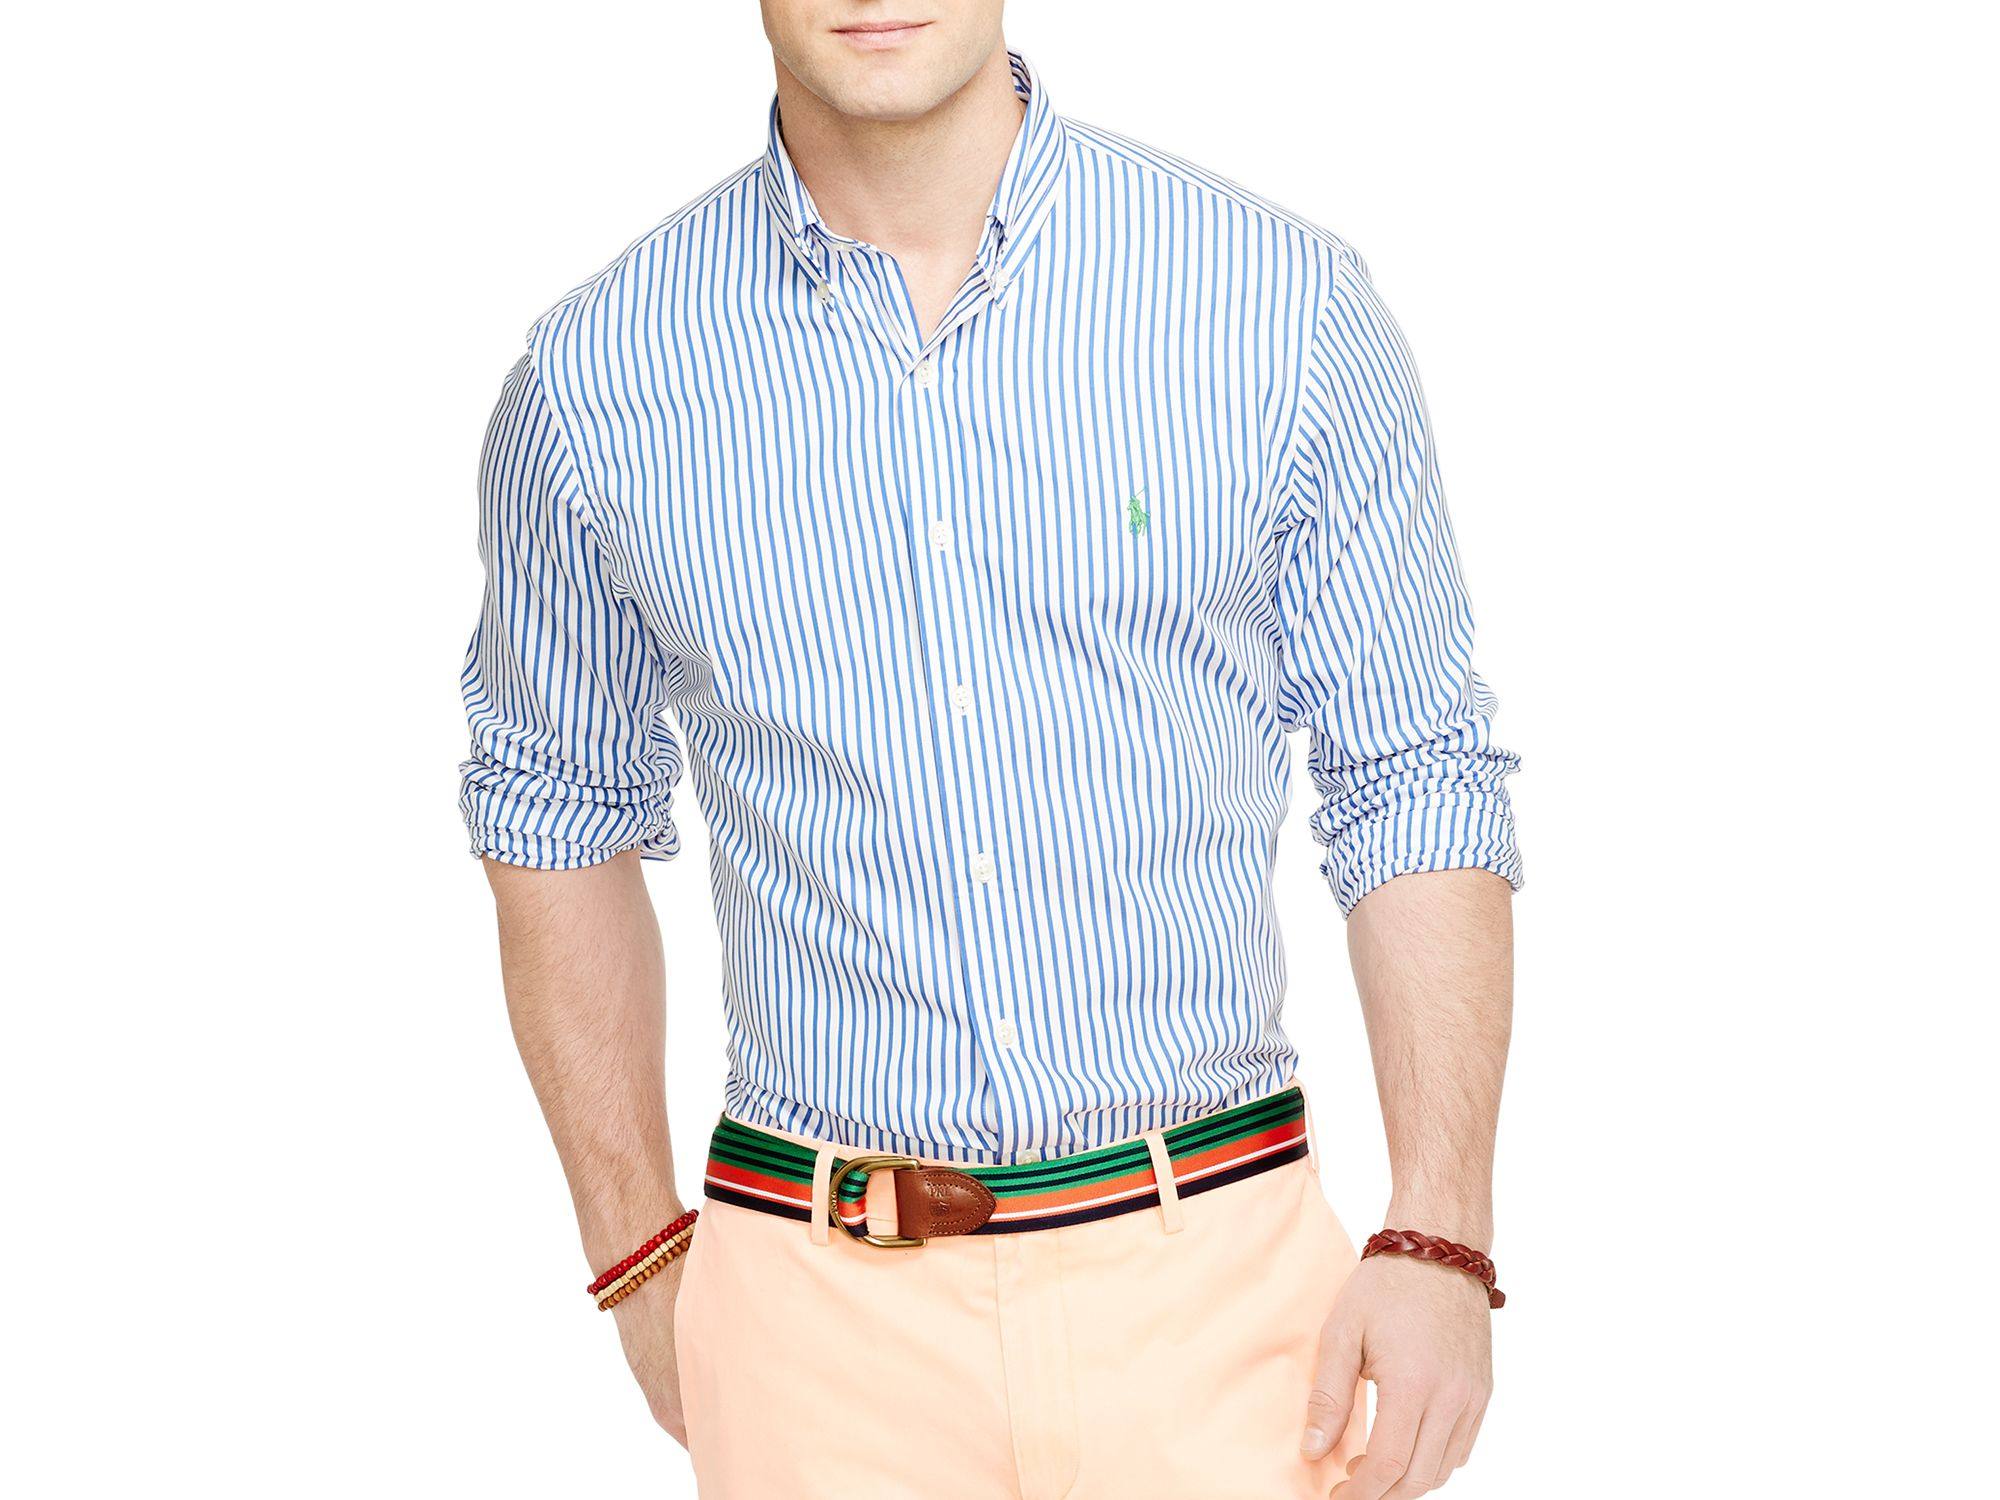 6105e6e4 ... aliexpress lyst ralph lauren polo bengal striped poplin button down  shirt in 4faa6 35ff3